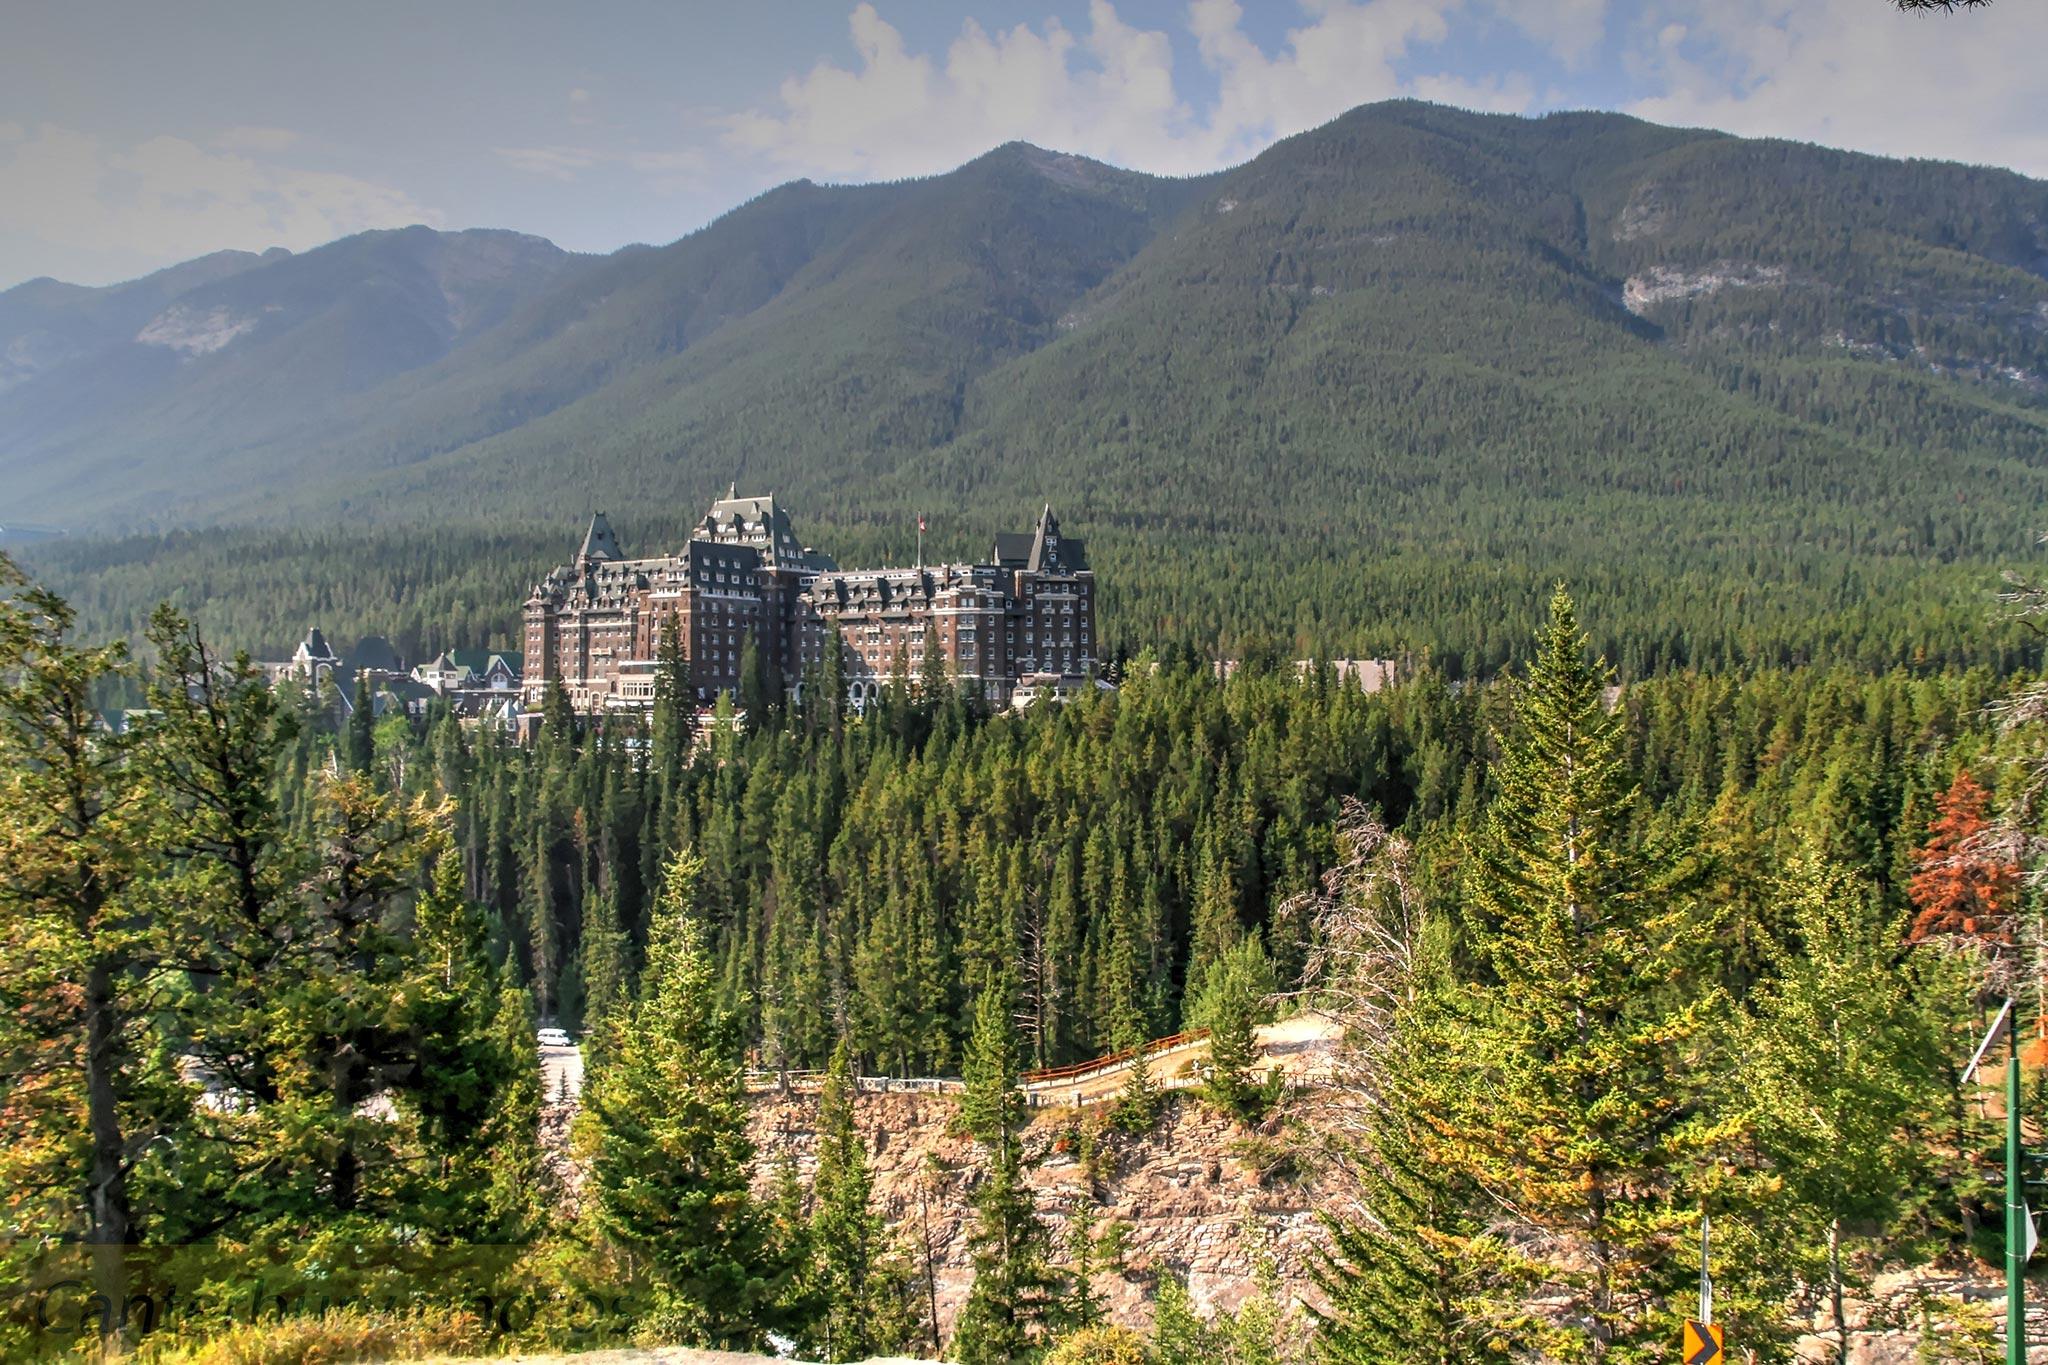 Fairmont-Banf-Springs-Hotel,-Alberta